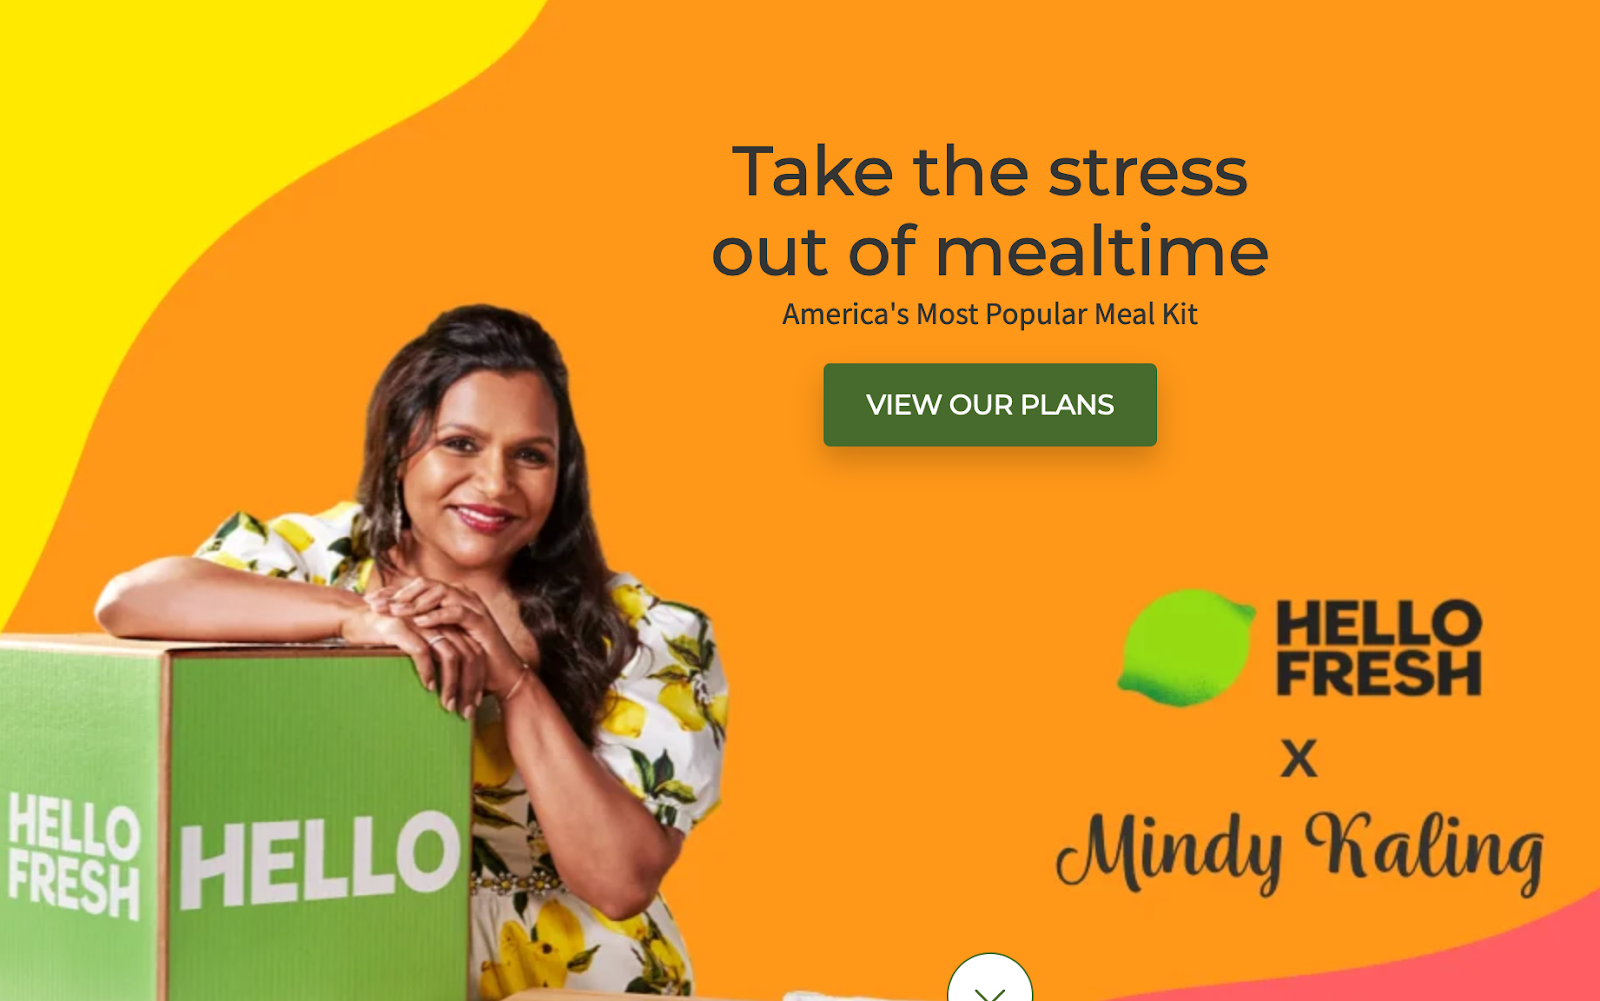 HelloFresh influencer partnership with Mindy Kaling